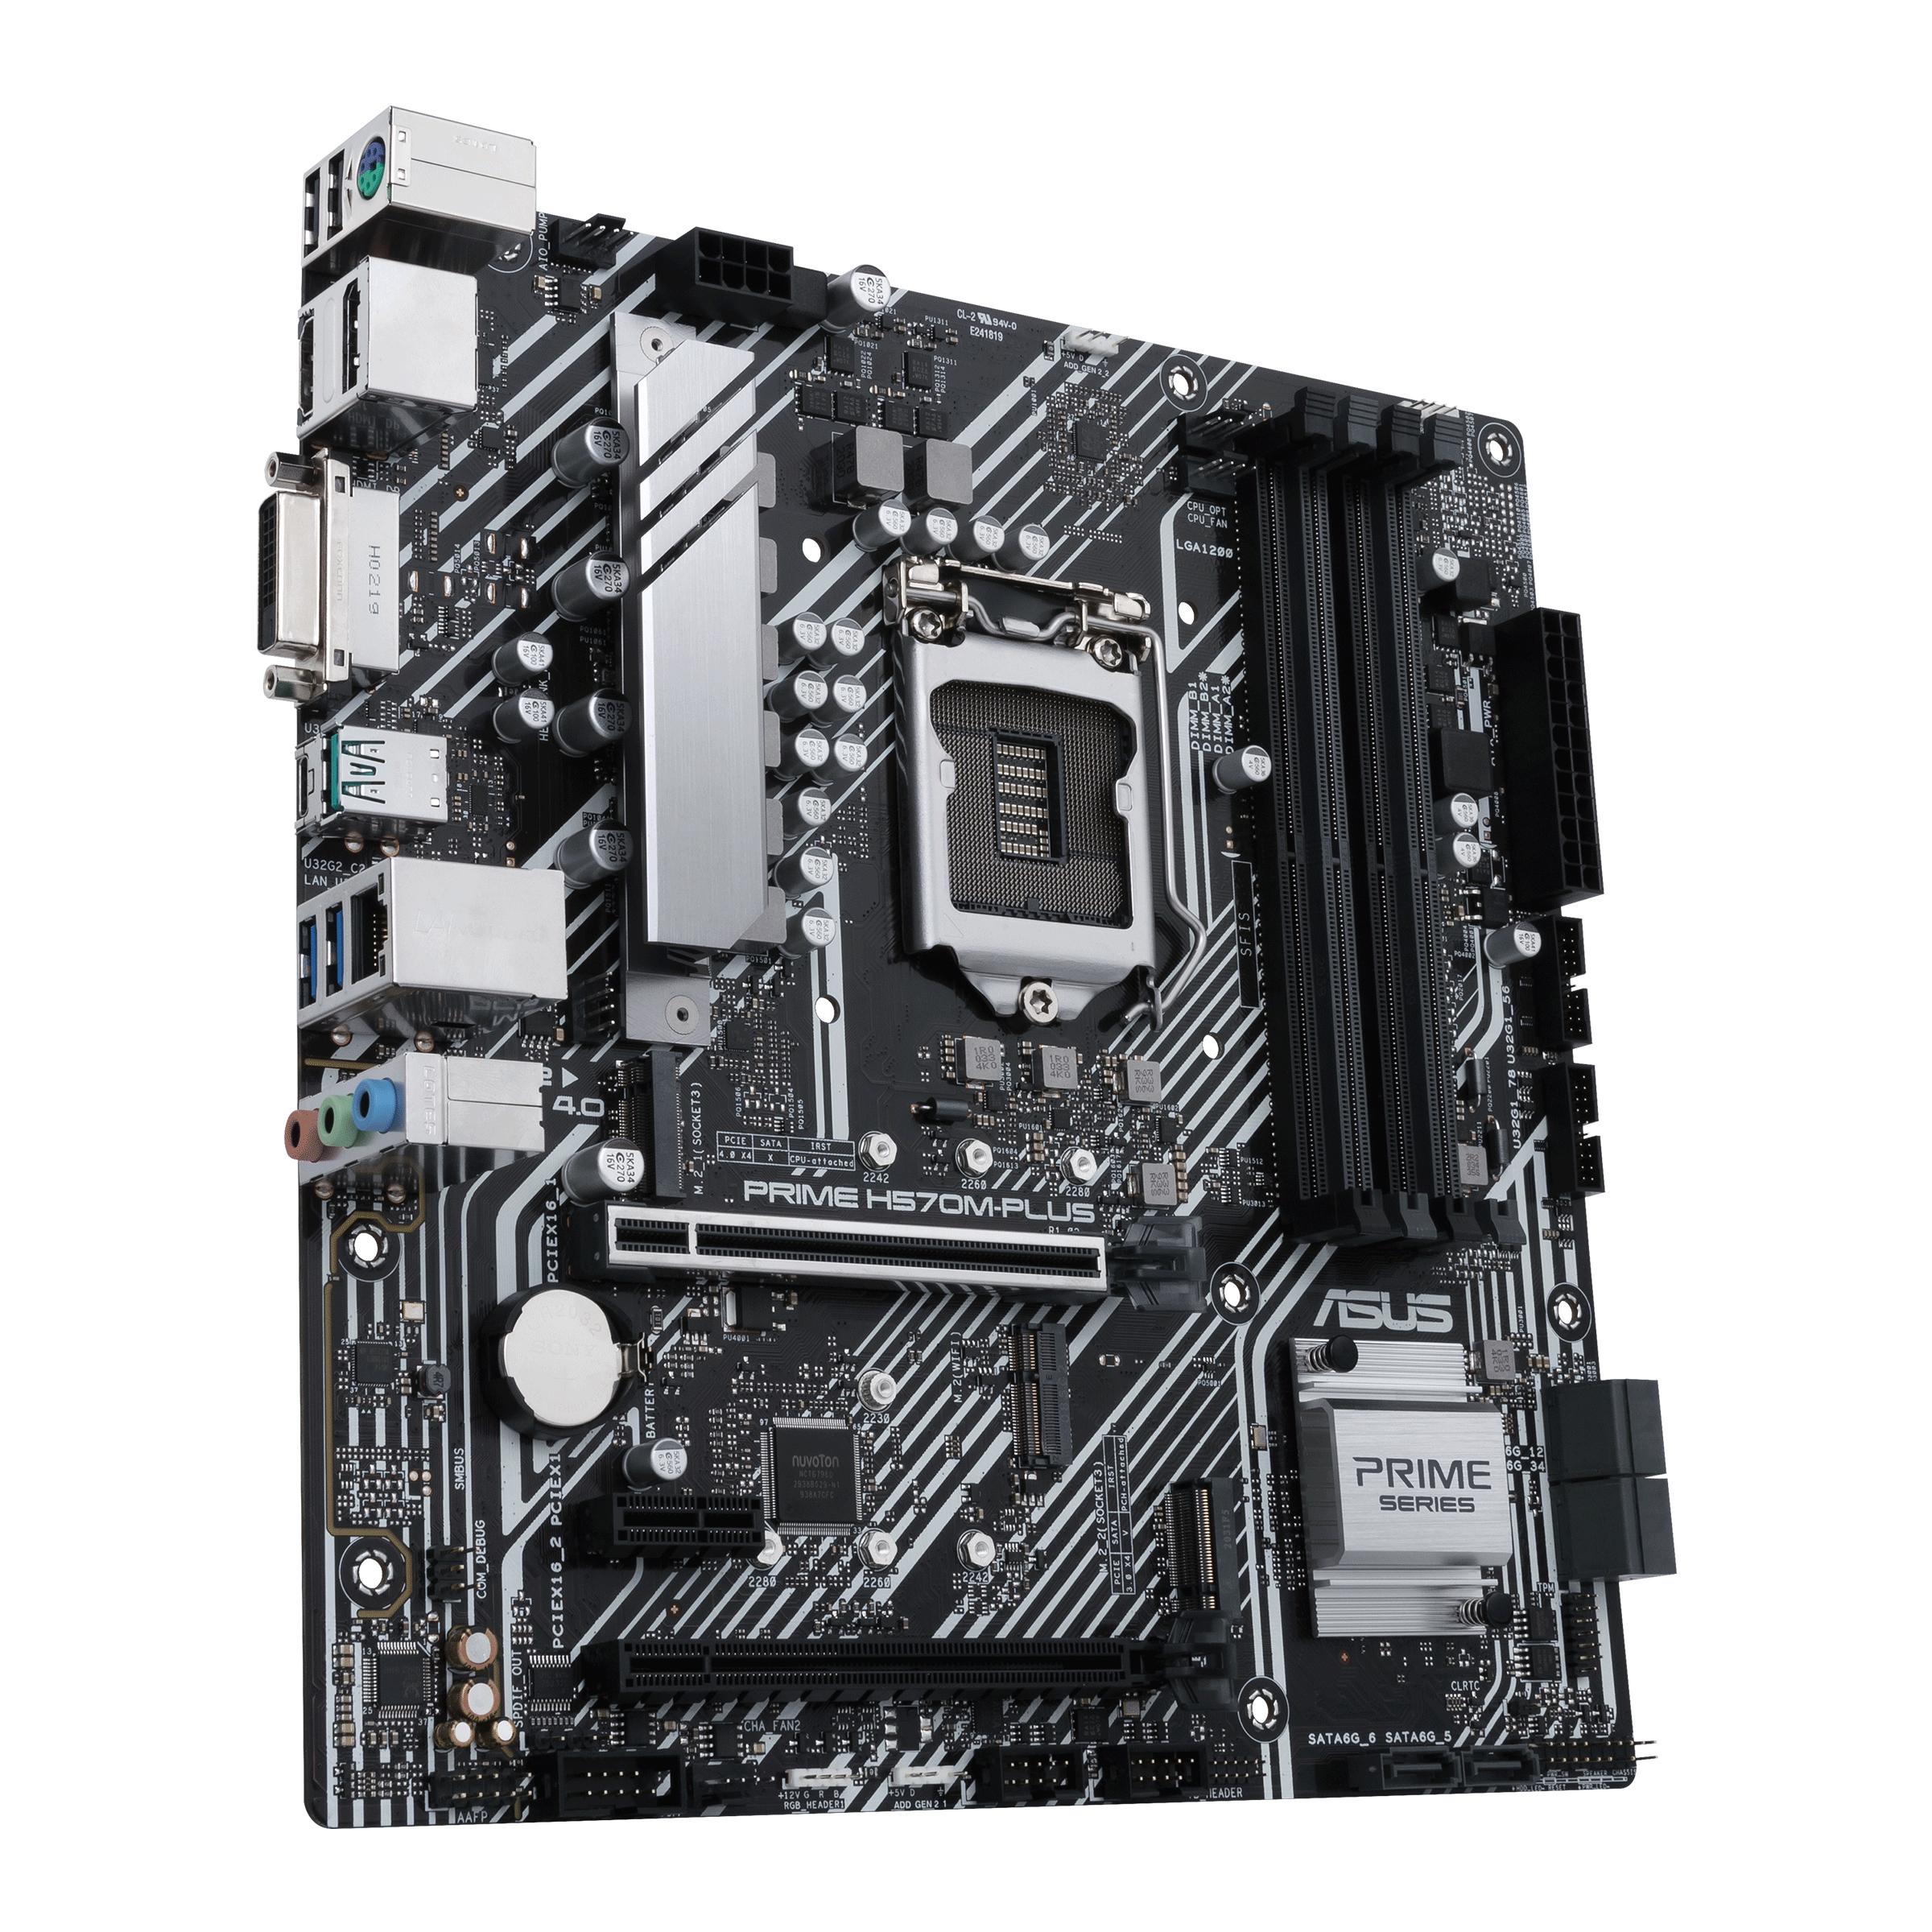 ASUS PRIME H570M-PLUS - Motherboard - micro ATX - LGA1200-Sockel - H570 - USB-C Gen2, USB 3.2 Gen 1, USB 3.2 Gen 2 - Gigabit LAN - Onboard-Grafik (CPU erforderlich)